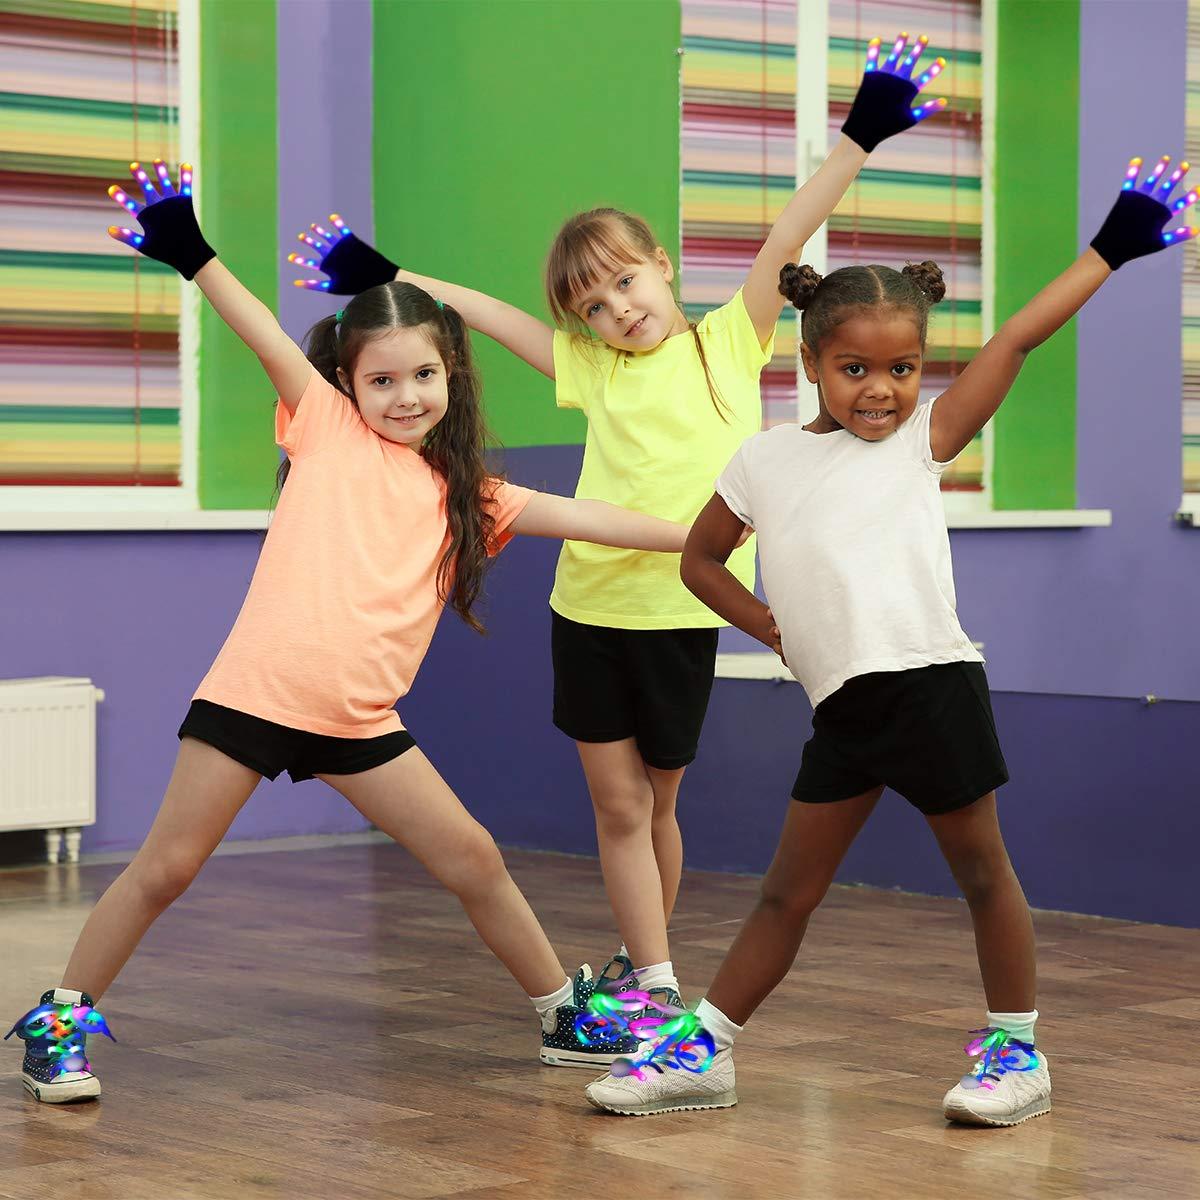 Aywewii LED Gloves for Kids Flashing Finger Light Up Gloves LED Shoelaces Set, LED Warm Gloves Kids Toys (Black)